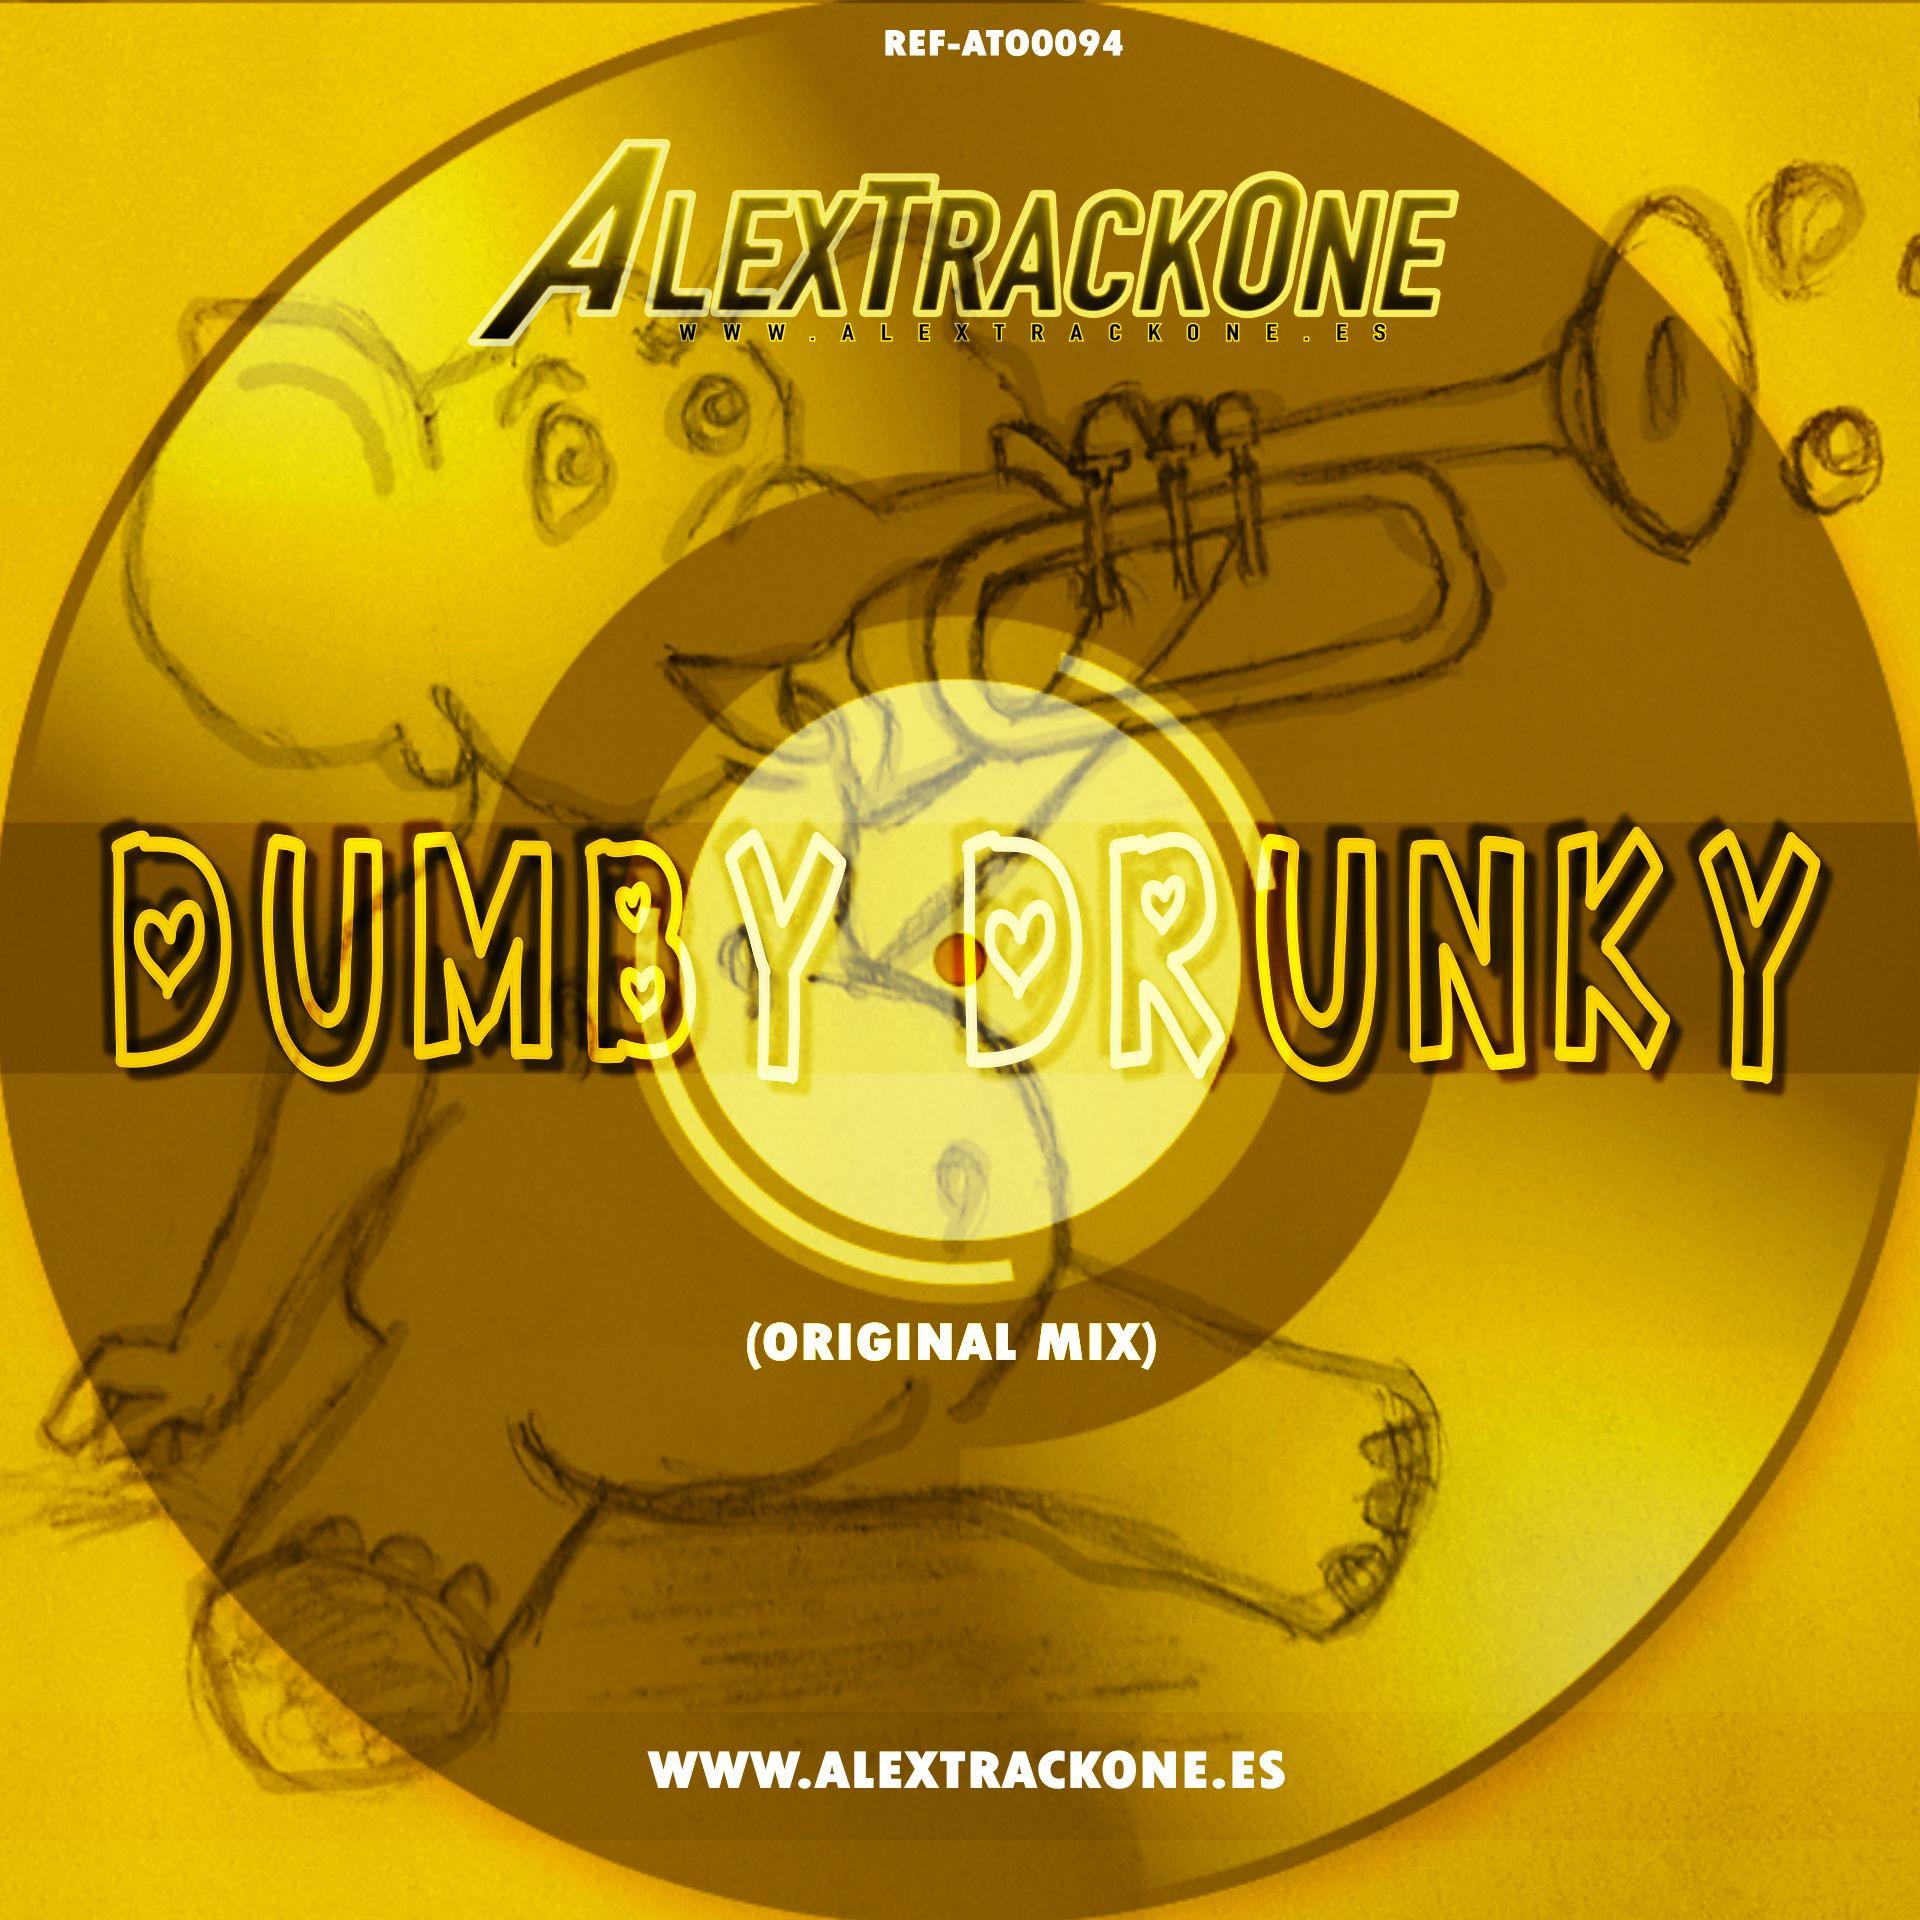 REF-ATO0094 DUMBY DRUNKY (ORIGINAL MIX) (MP3 & WAV & FLAC)